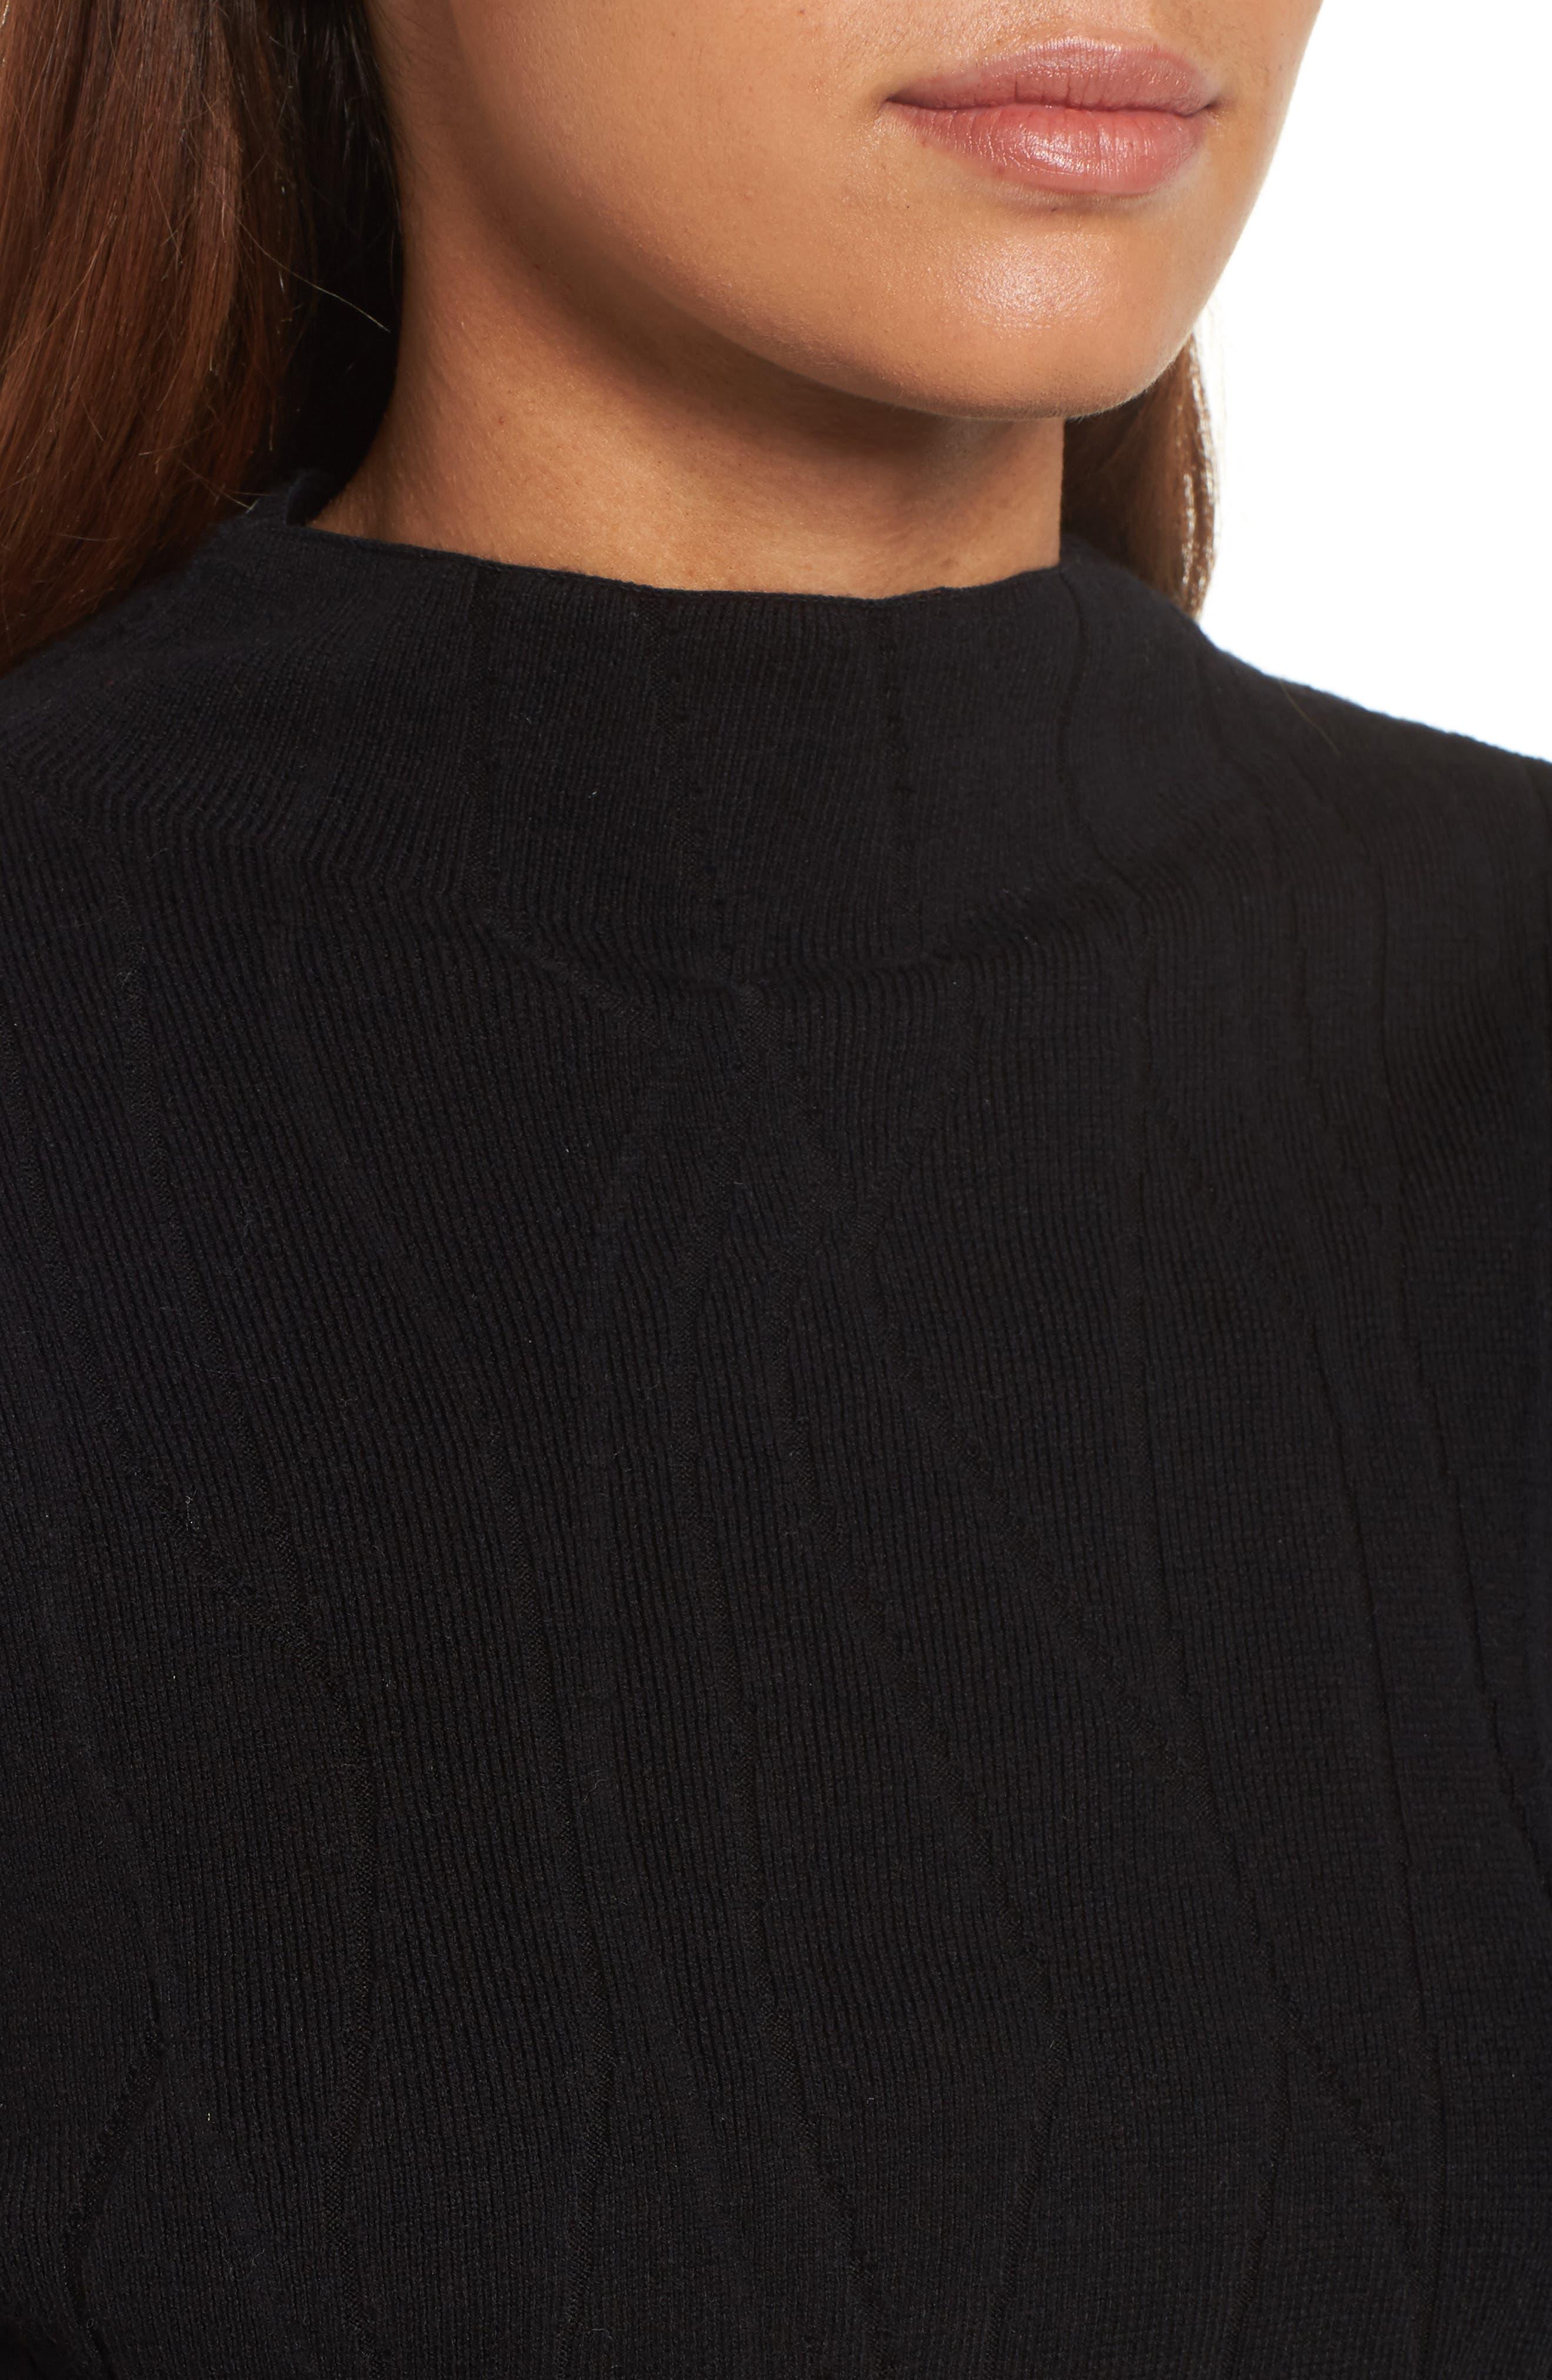 Artisanal Crackle Jacquard Sweater,                             Alternate thumbnail 4, color,                             004